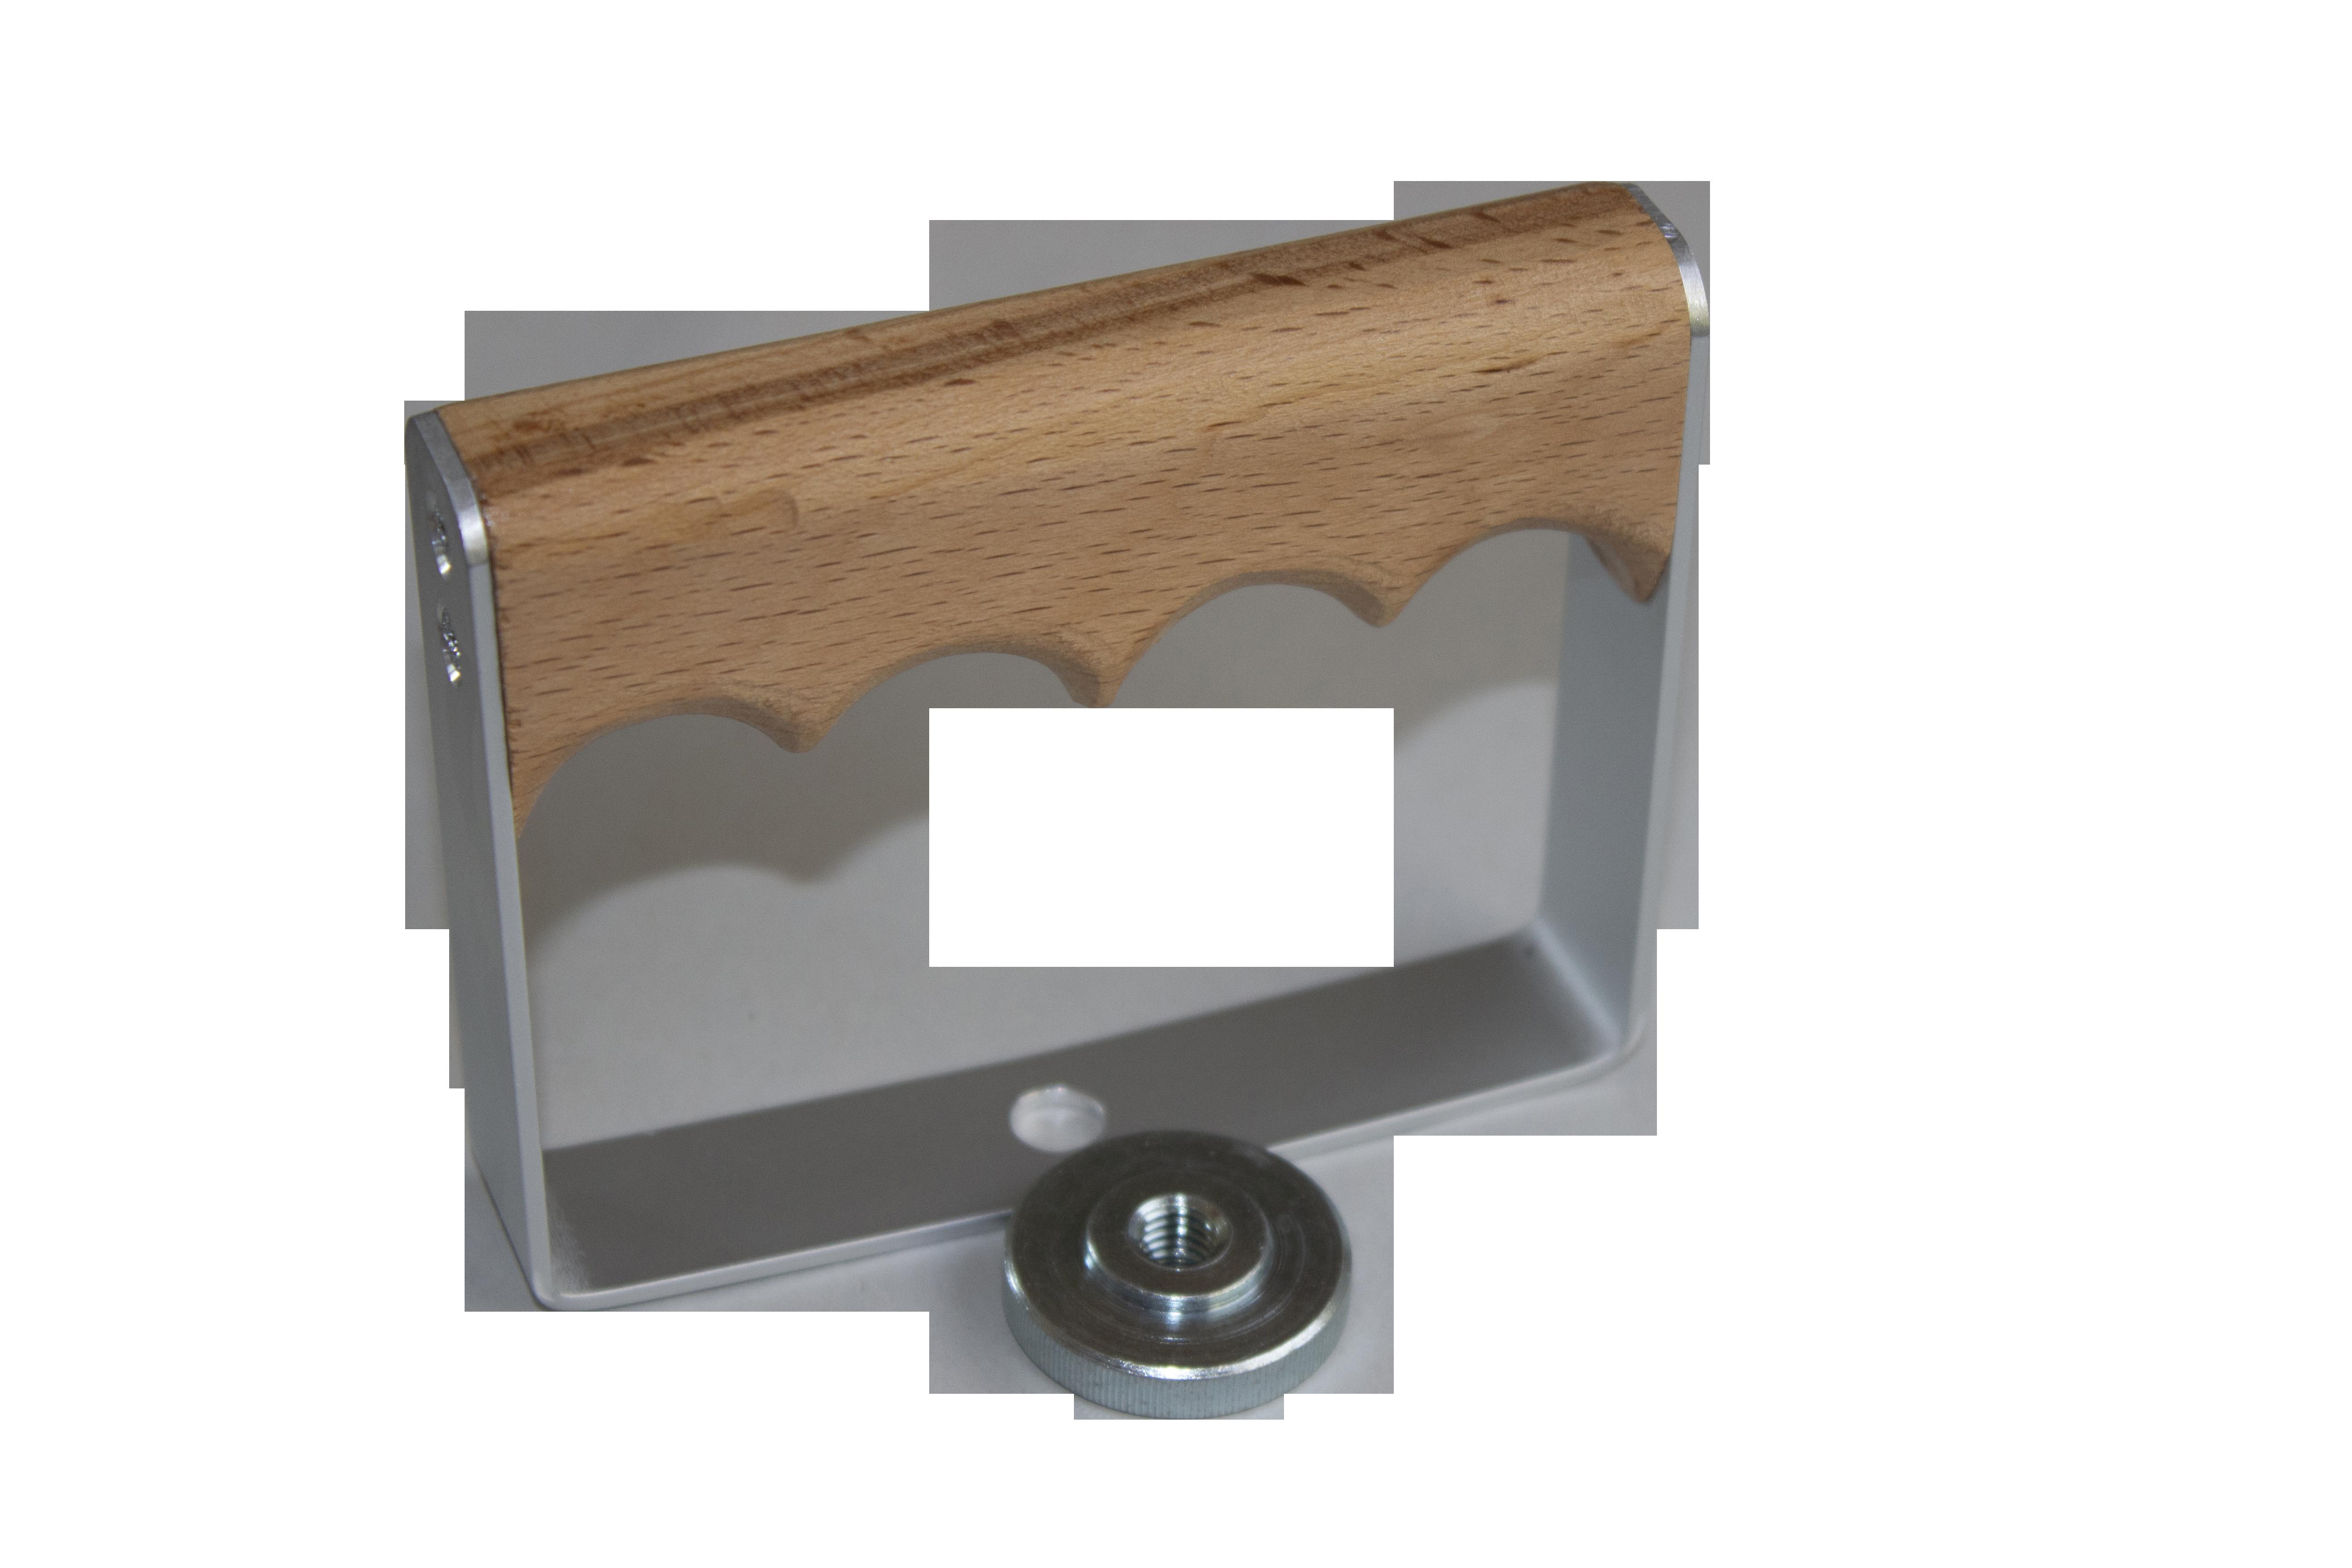 Bügelgriff, Aluminium - Holz (414)